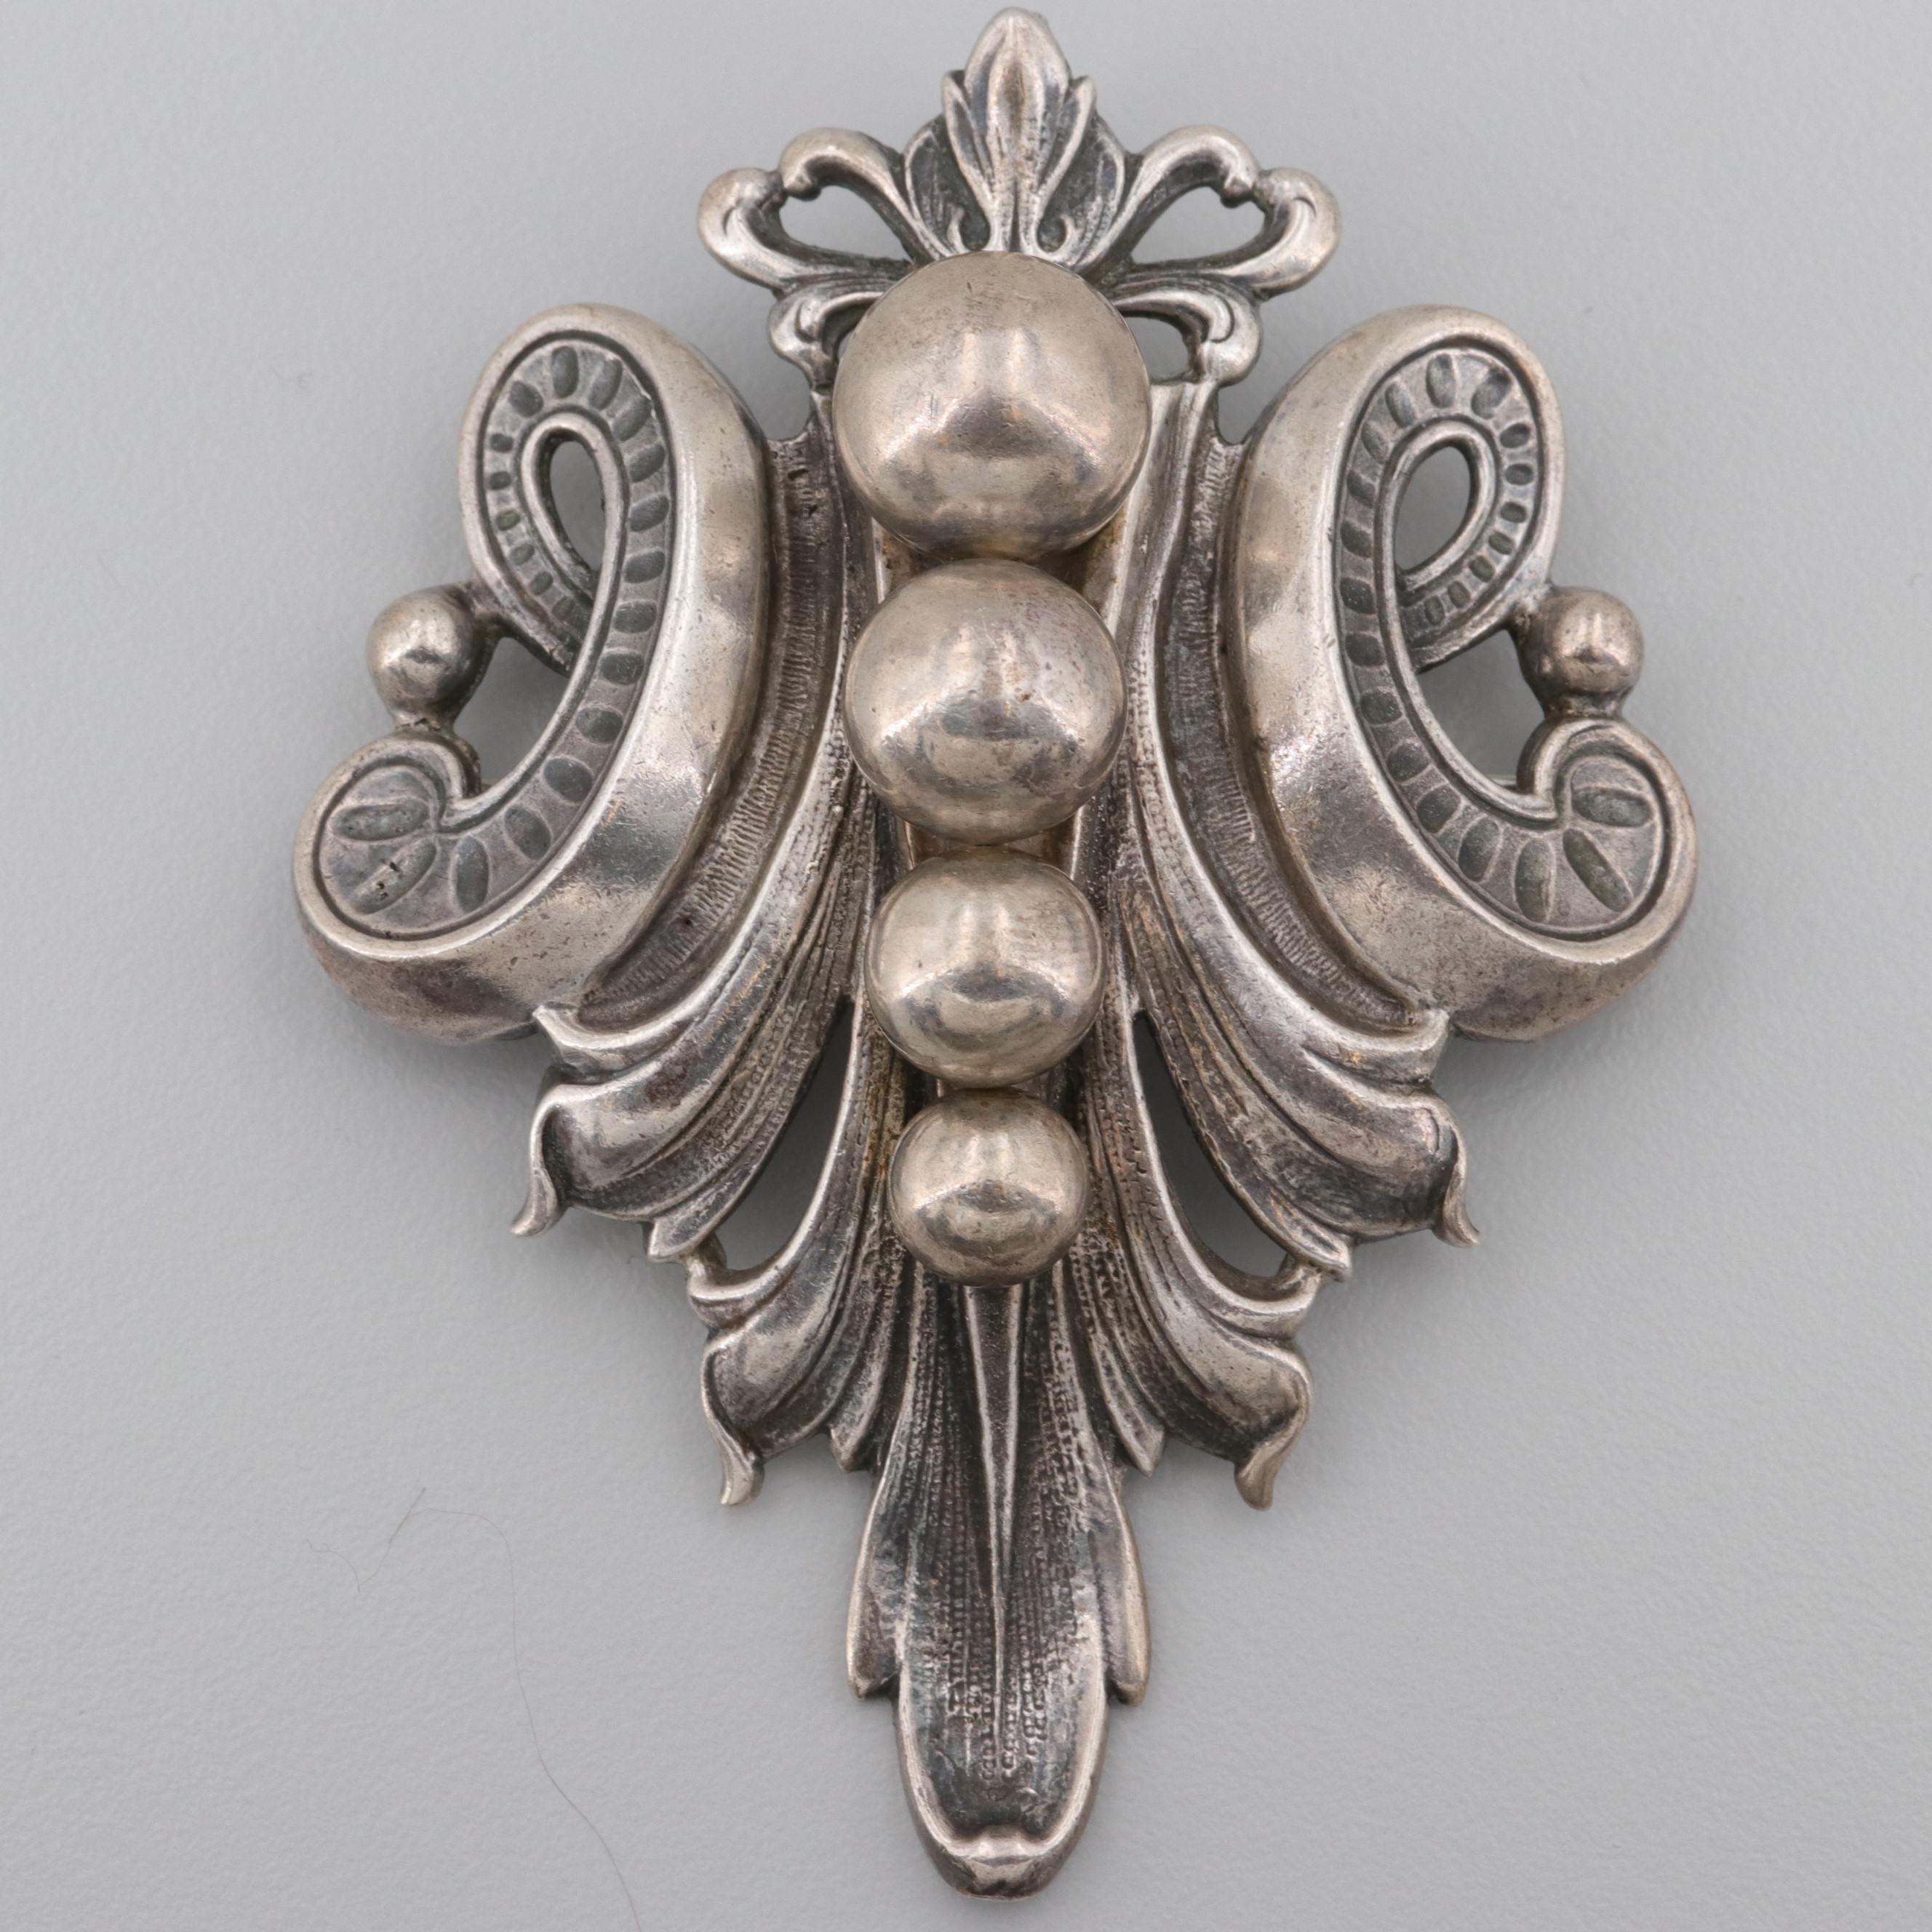 Vintage Guglielmo Cini Sterling Silver Brooch